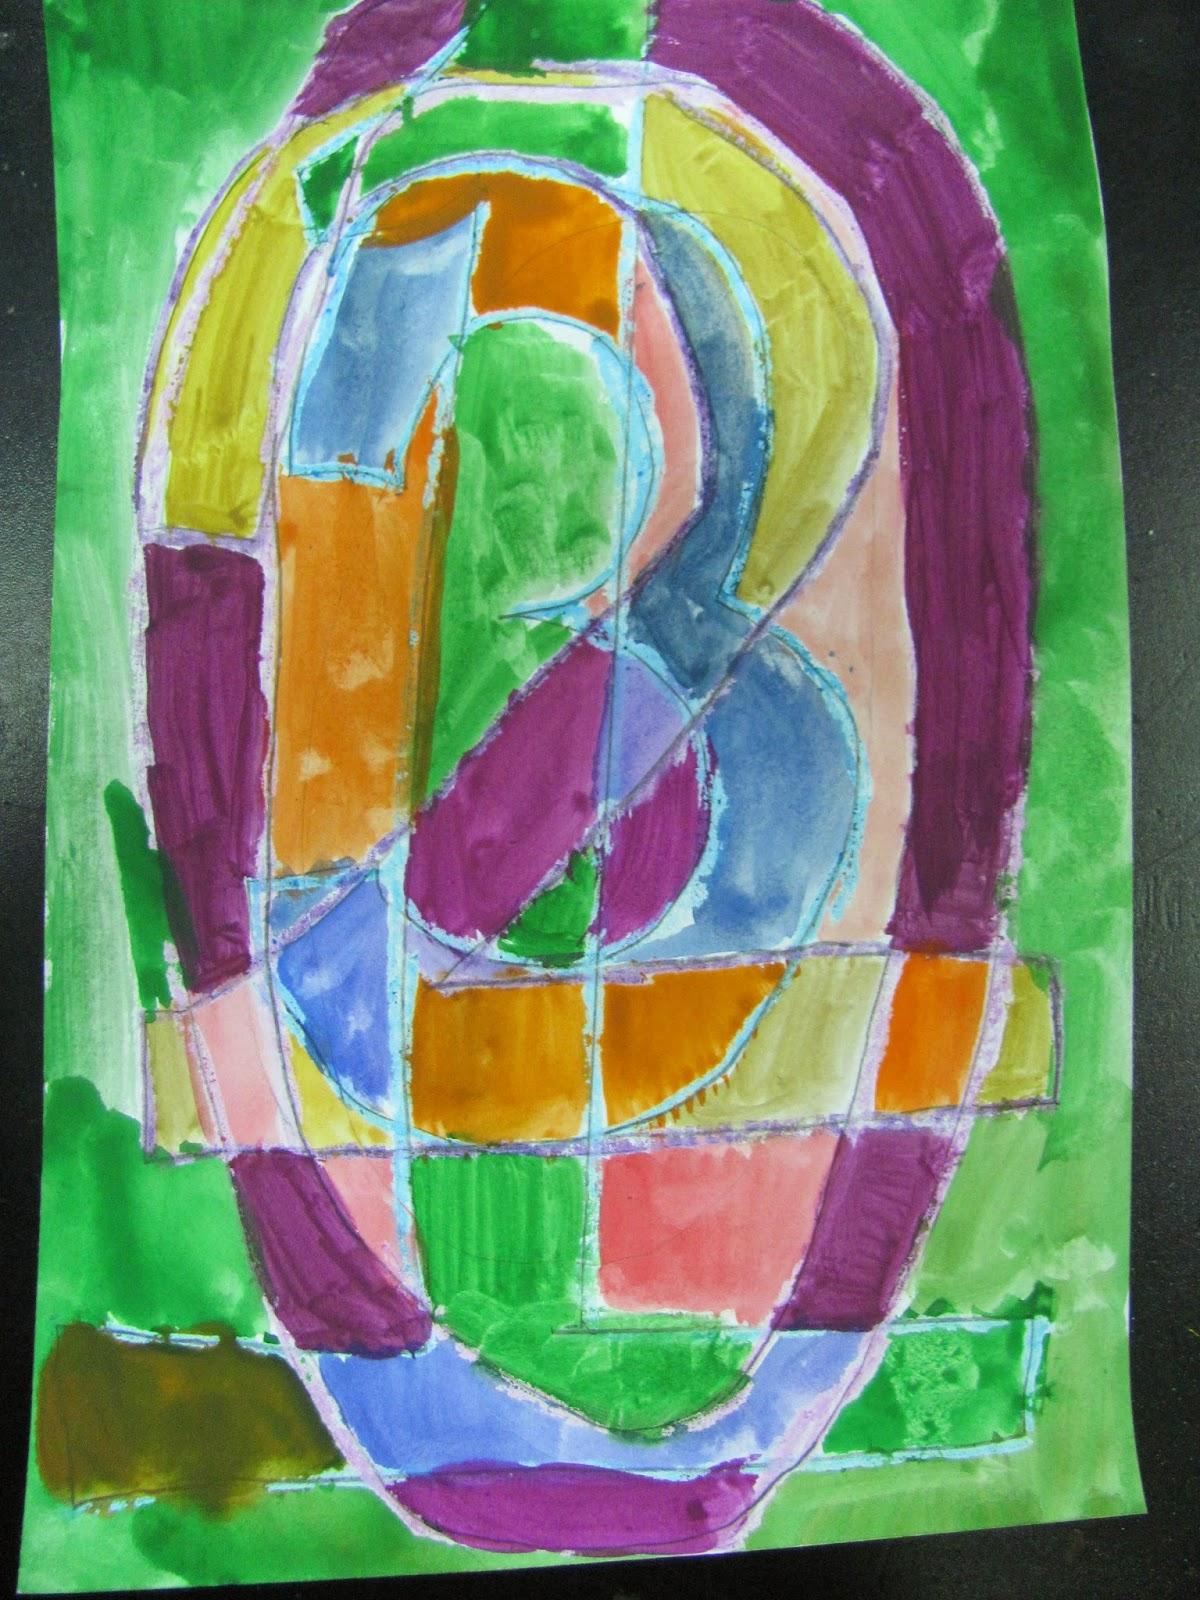 ES MS Art at Dalat: 3rd Grade Project: Jasper Johns - Numbers